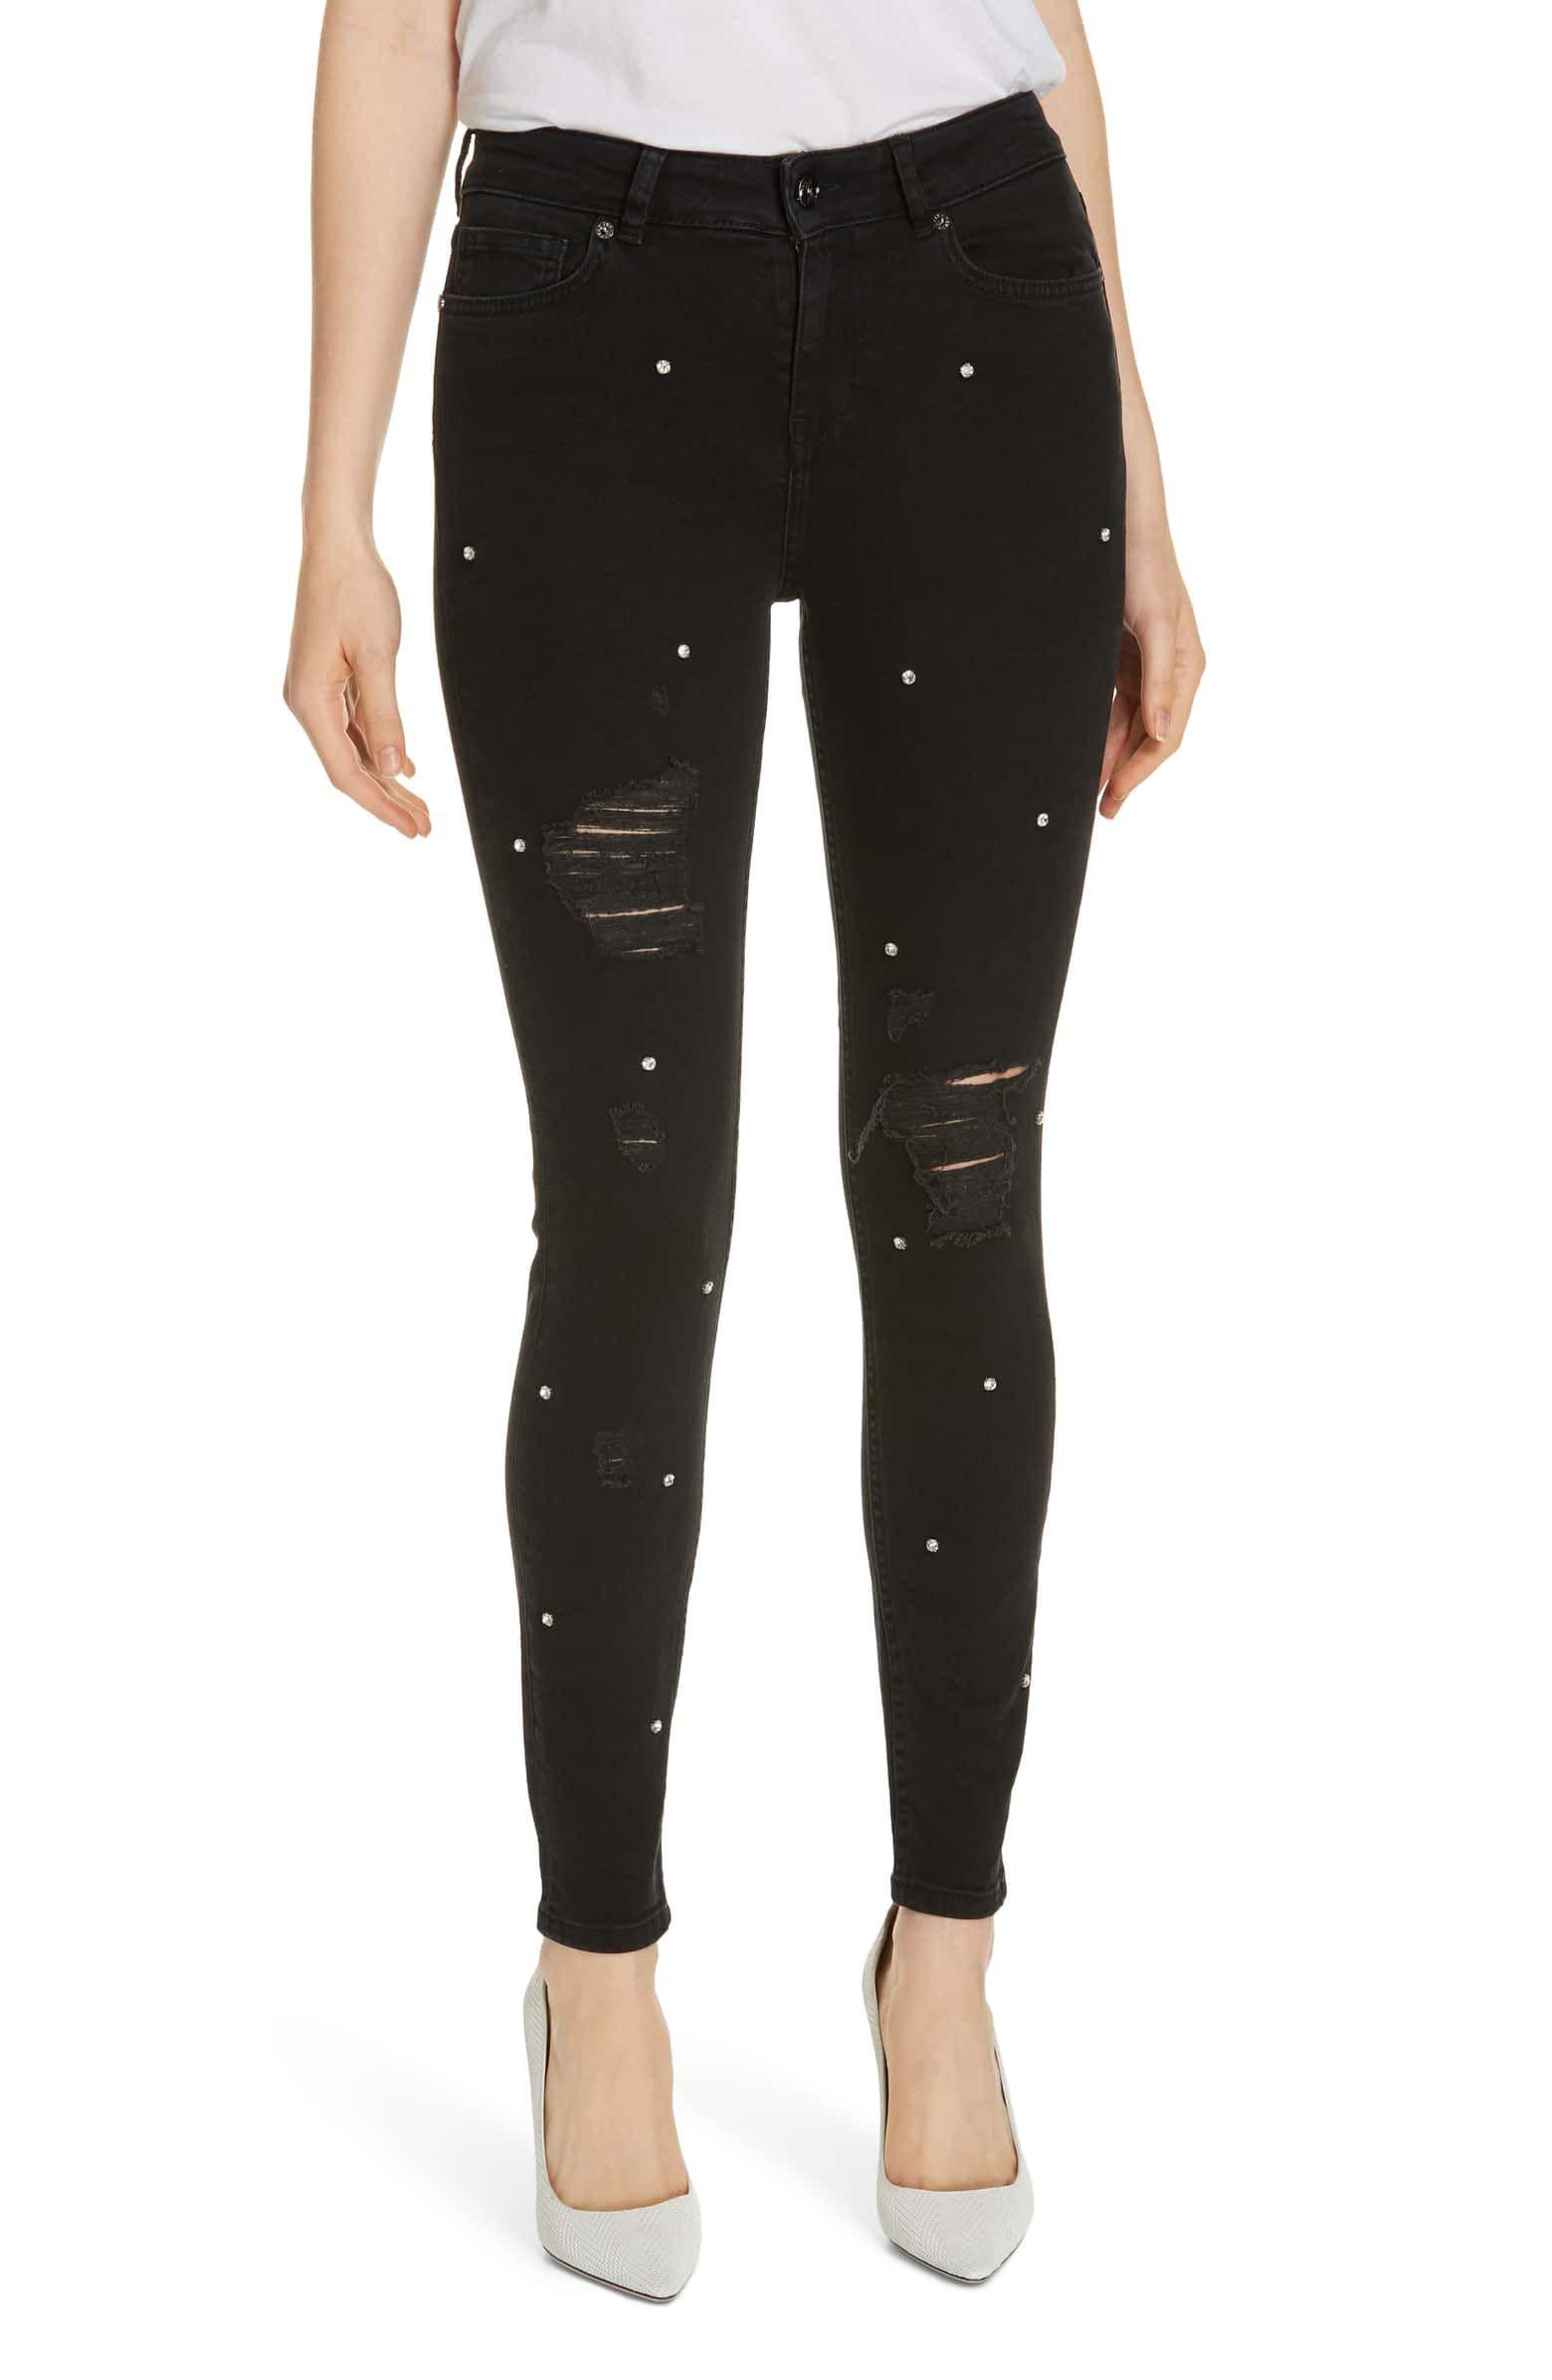 6b72091a1c Bretie Diamante Skinny Jeans